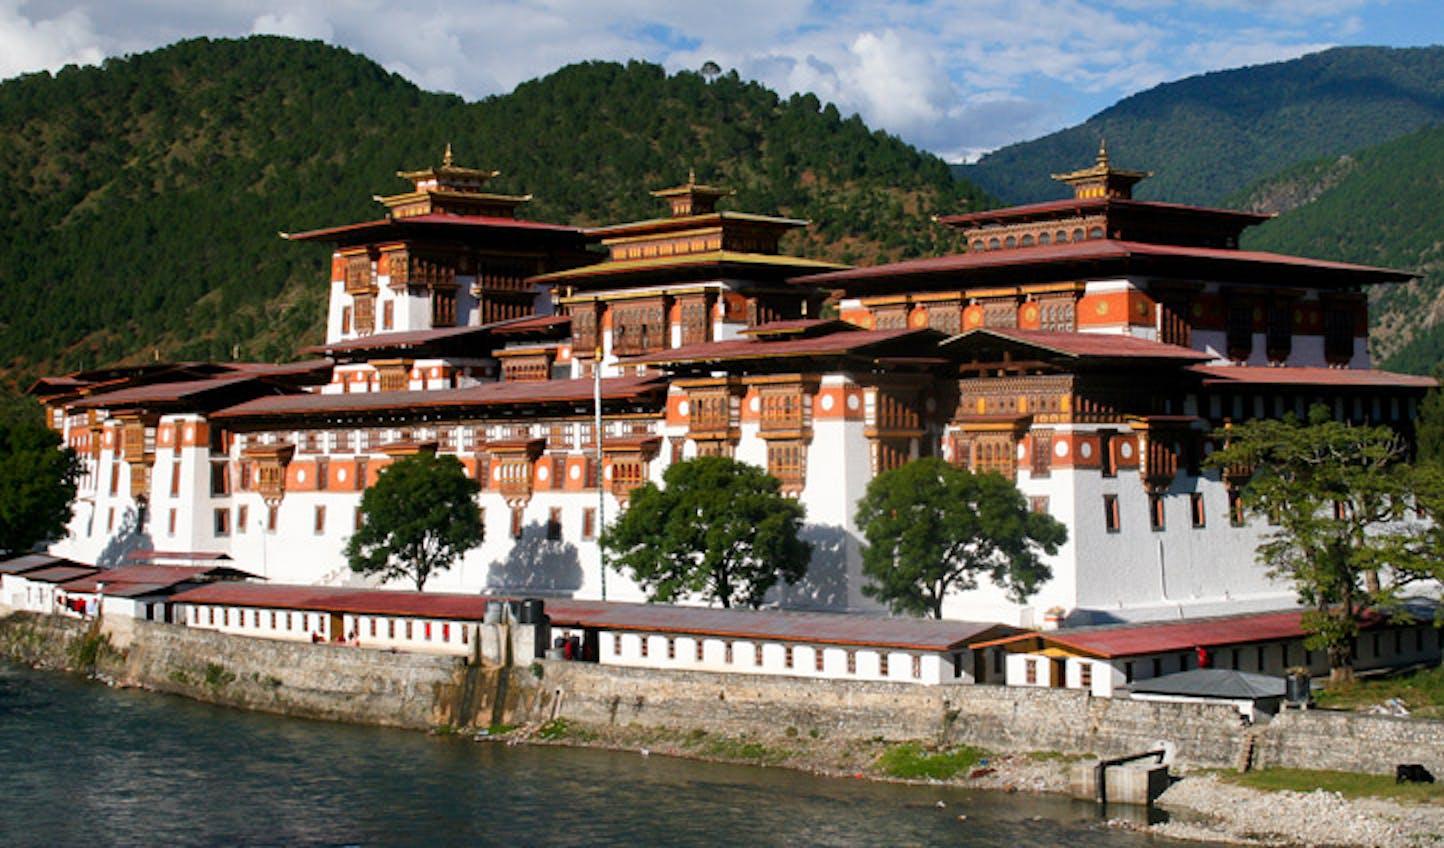 bhutan culture architecture